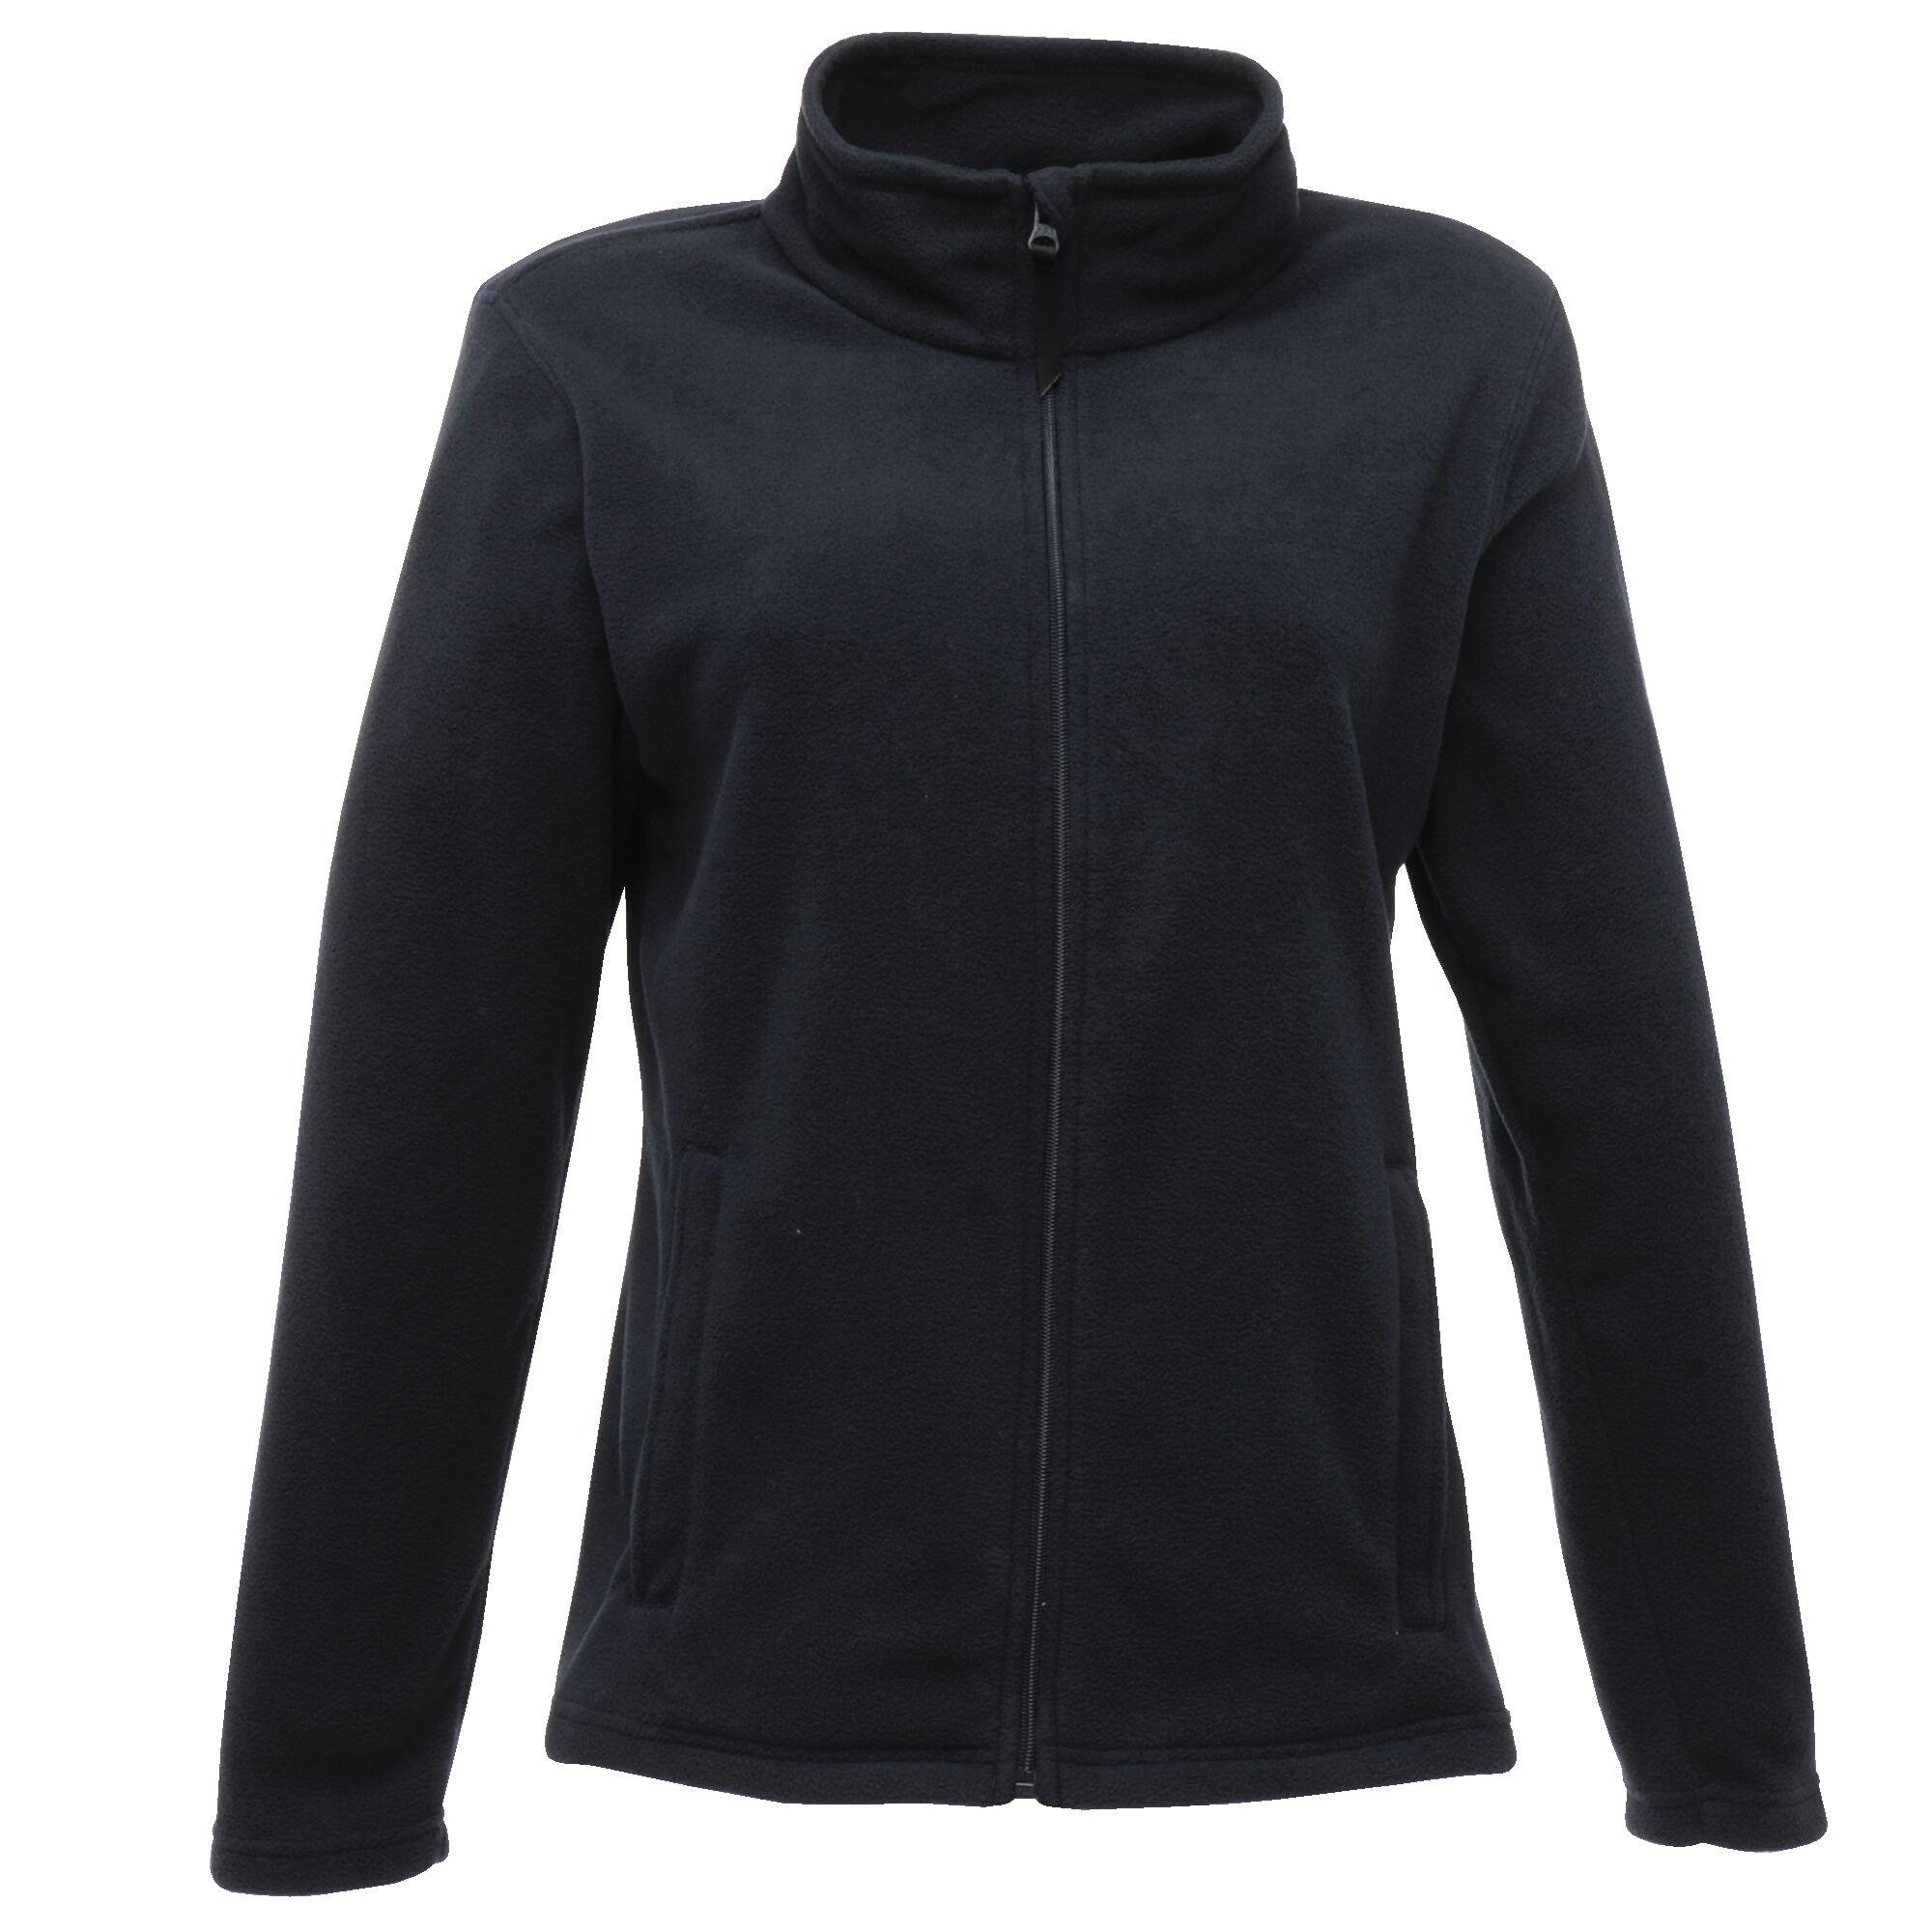 Regatta Womens/Ladies Full-Zip 210 Series Microfleece Jacket (18) (Dark Navy)